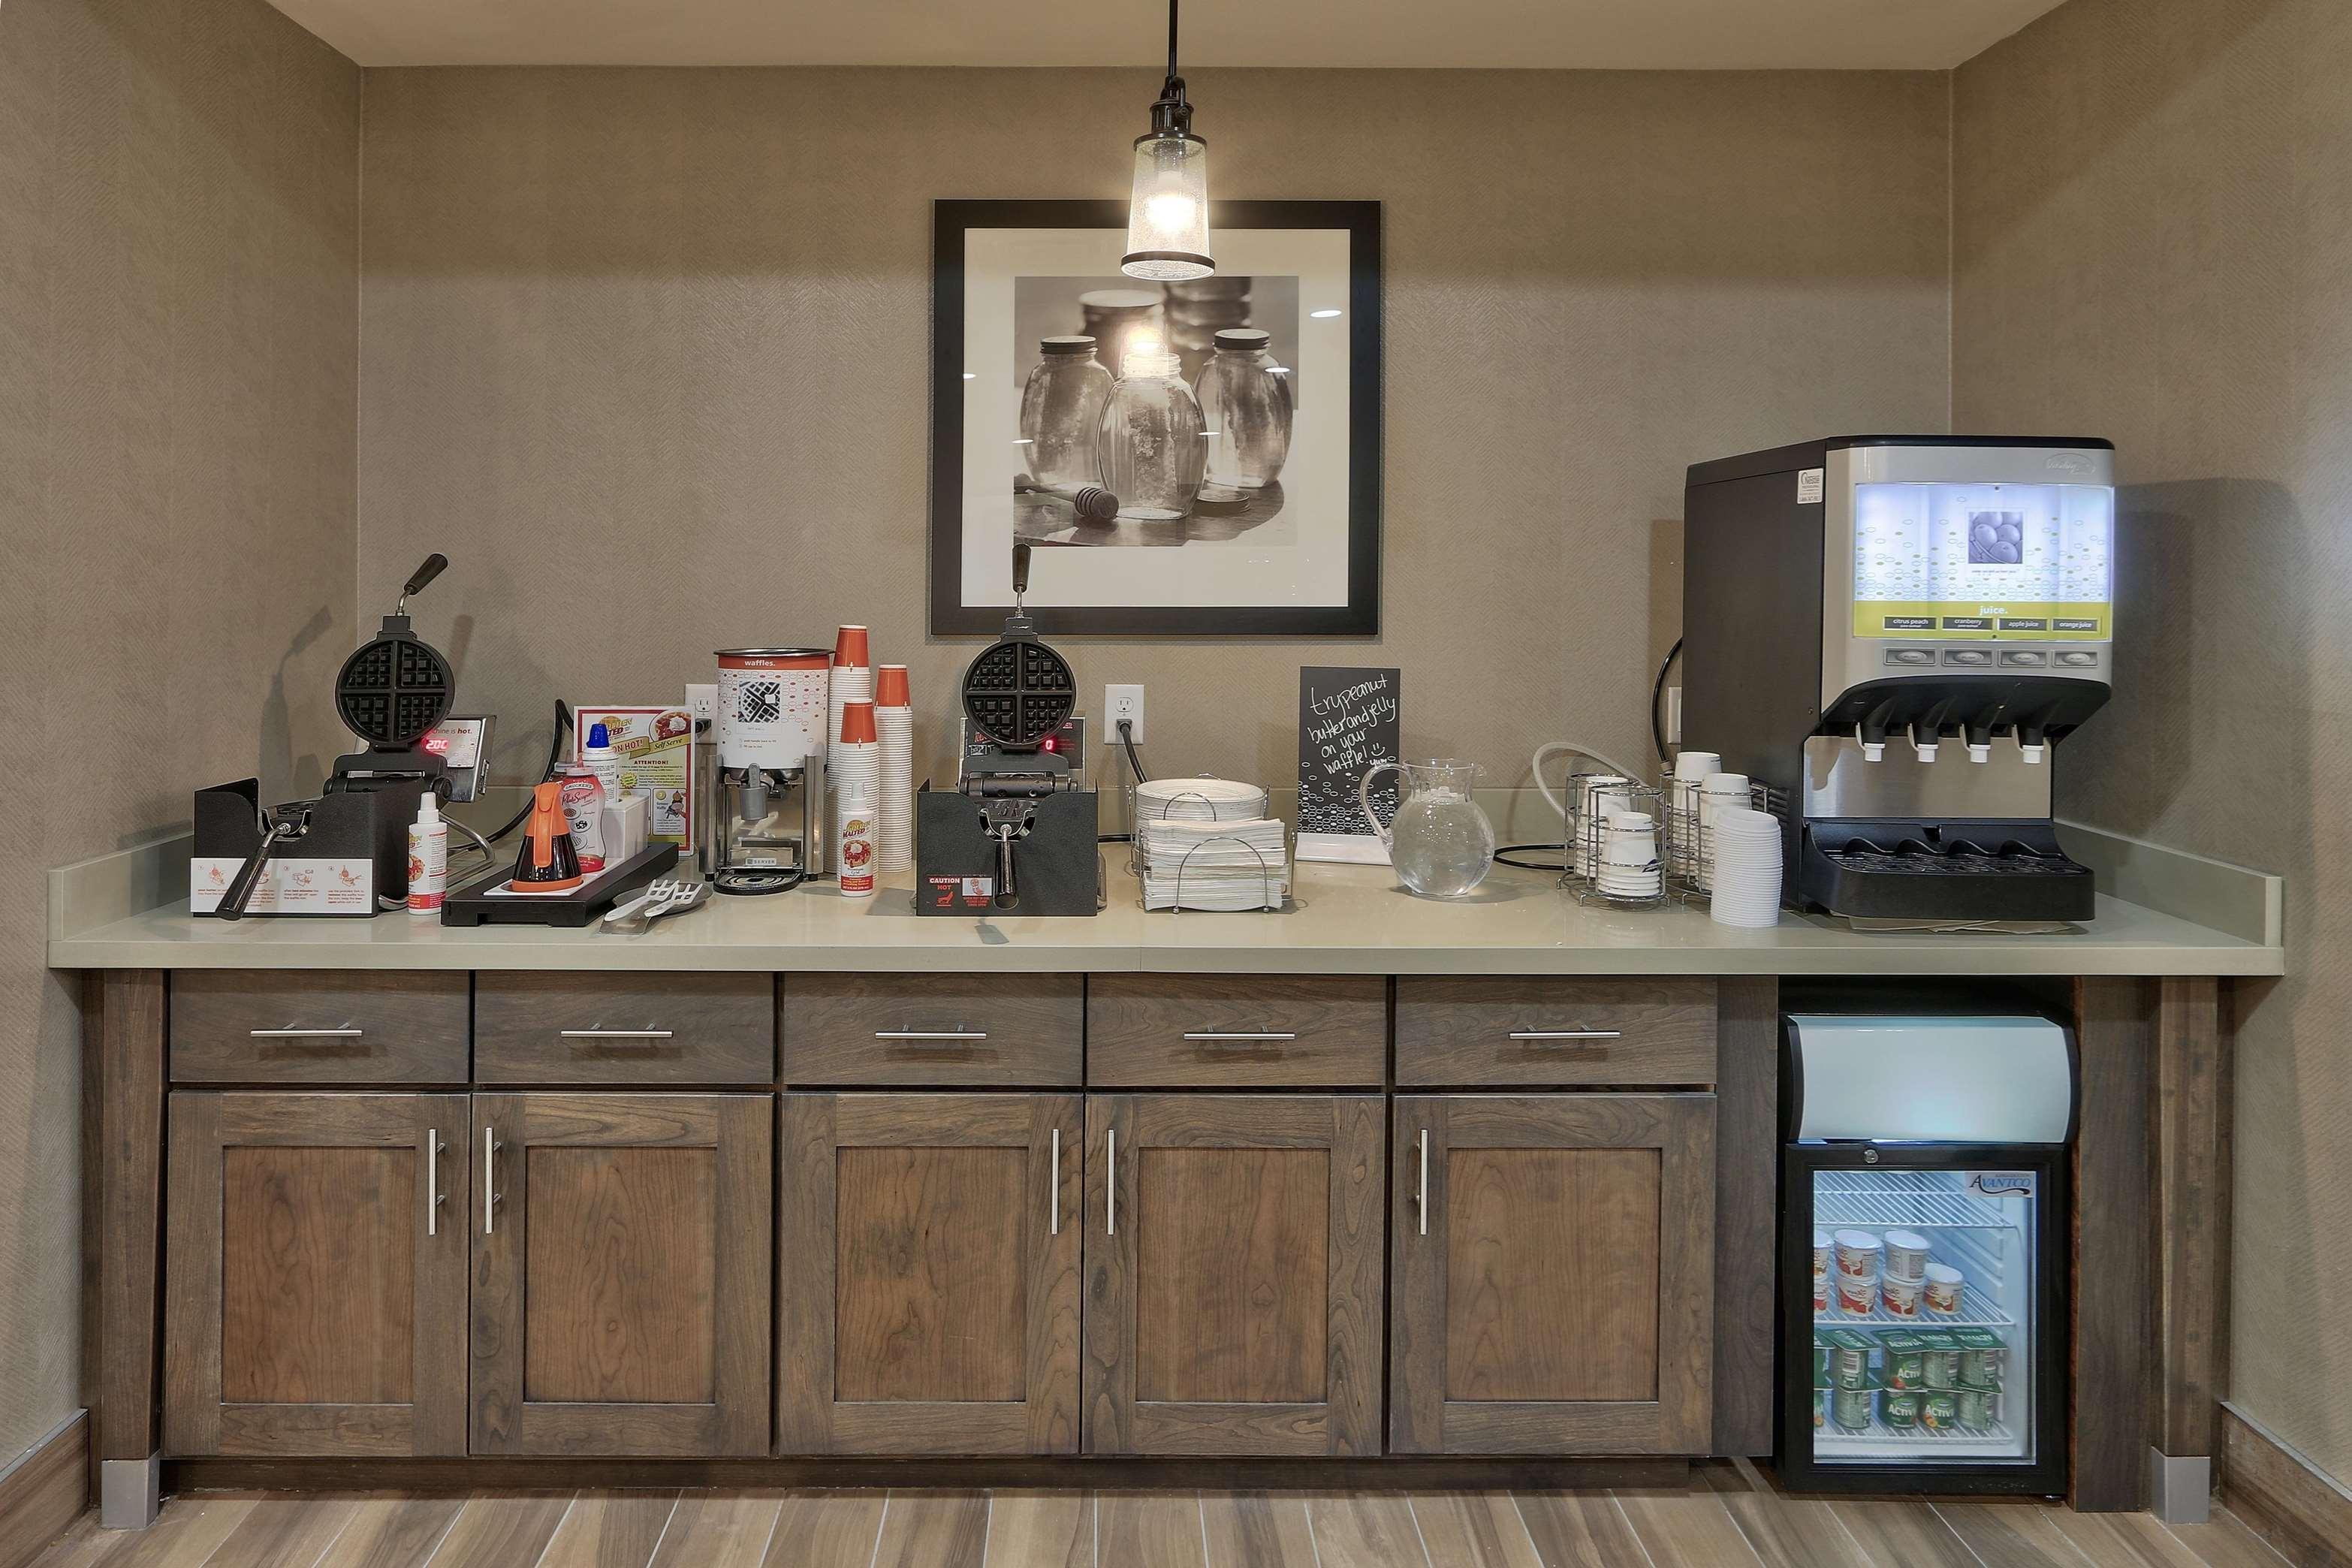 Hampton Inn & Suites Artesia image 16